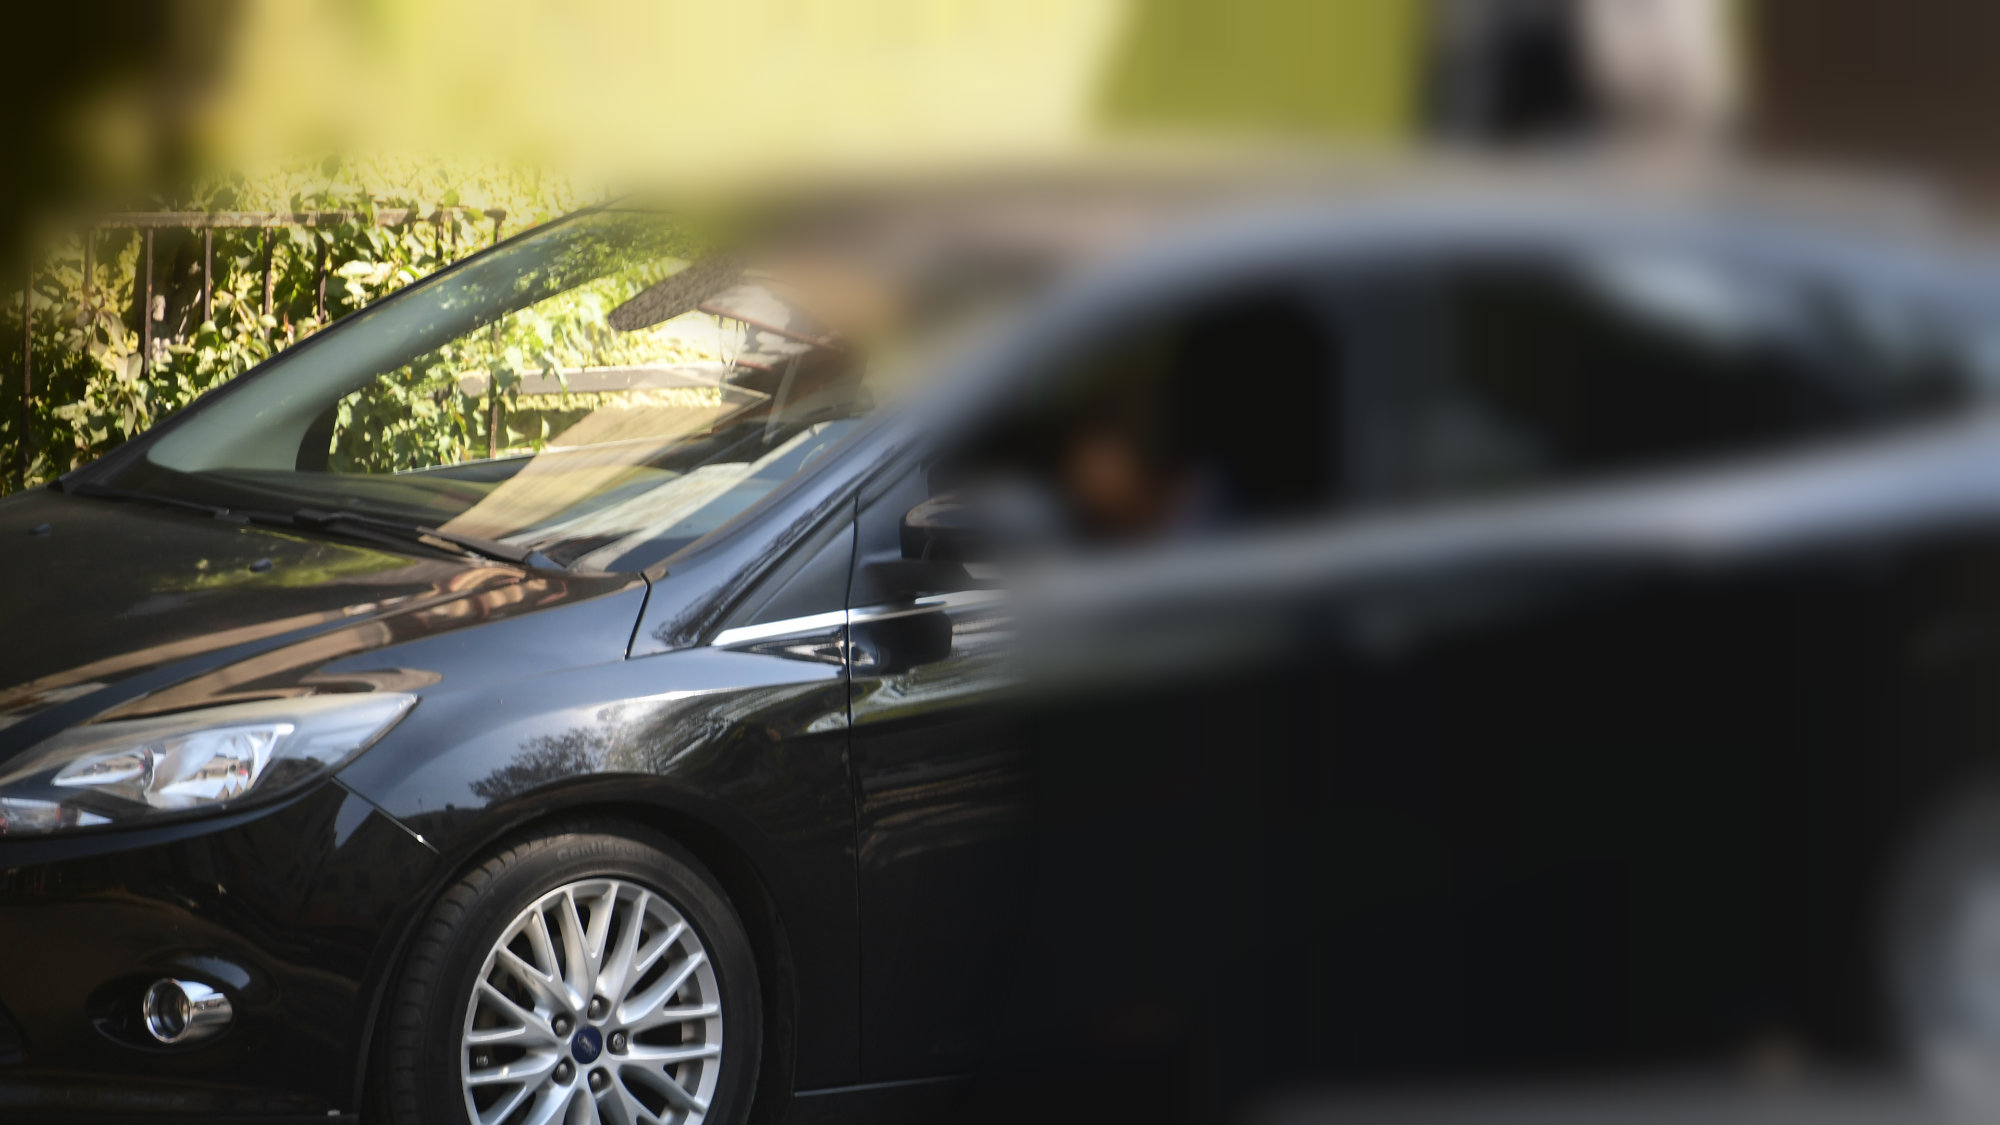 Motosicarios ejecutan automovilista alcaldía Azcapotzalco